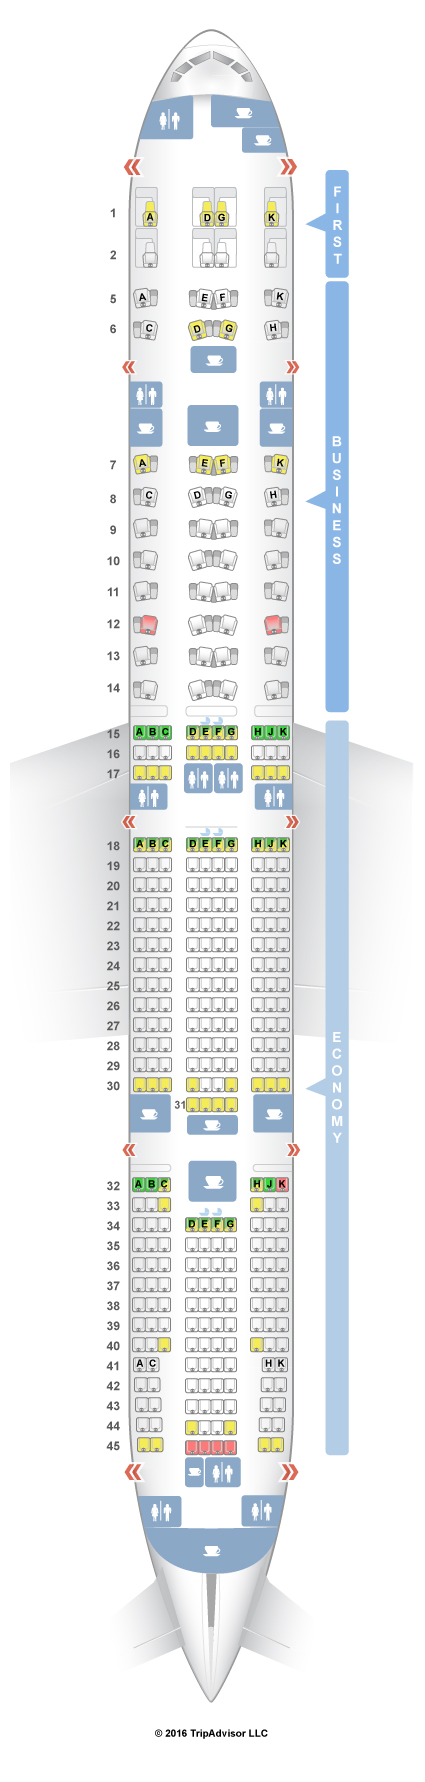 Seatguru seat map etihad boeing 777 300er 77w three class for Plan cabine 777 300er